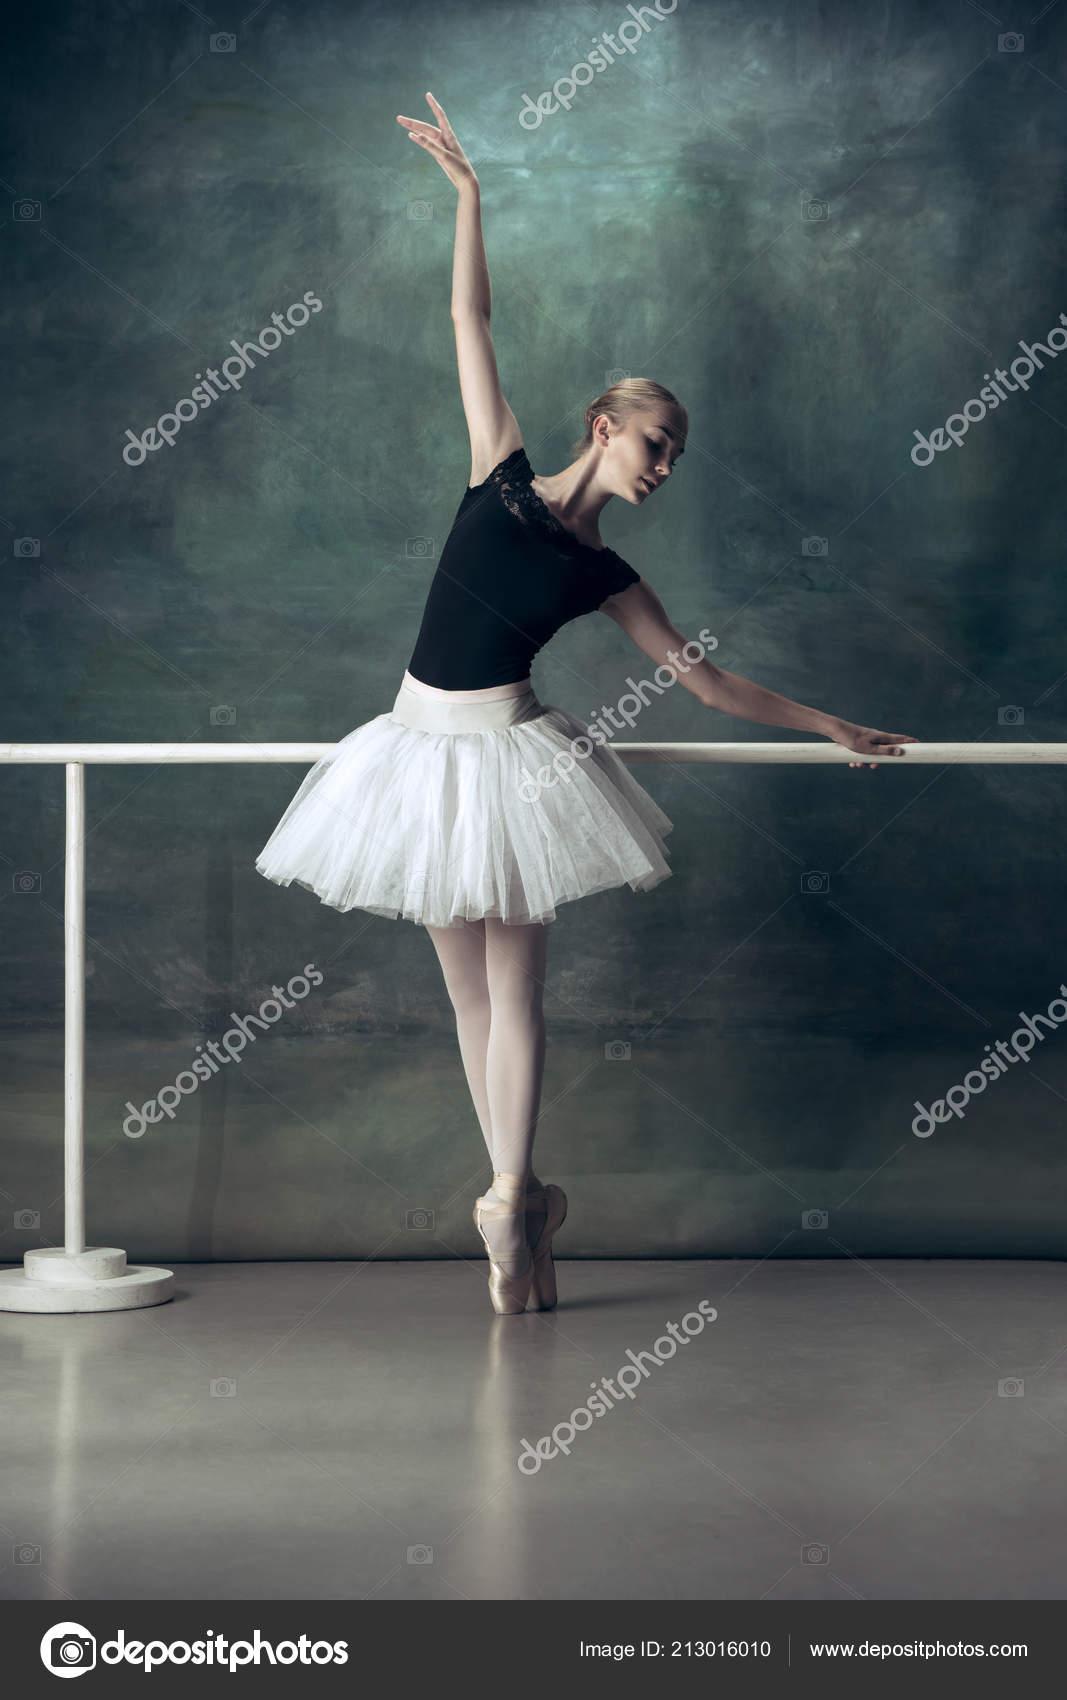 Photos Ballet Poses For The Classic Ballerina Posing At Ballet Barre Stock Photo C Vova130555 Gmail Com 213016010